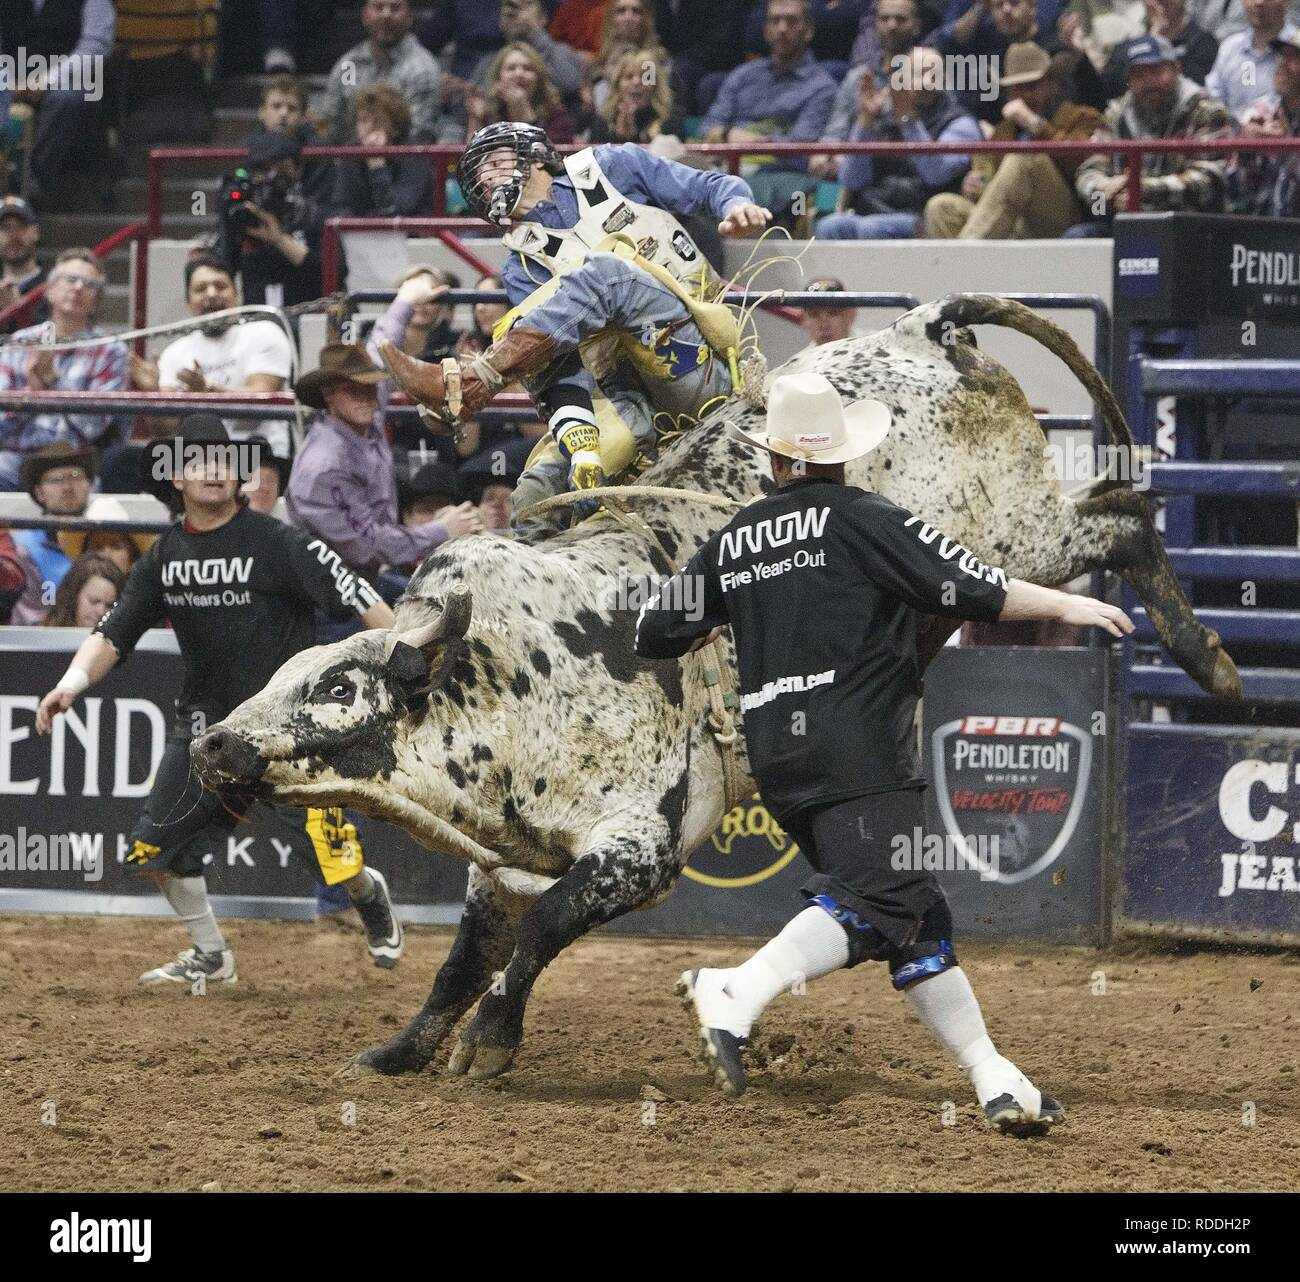 Denver, Colorado, USA  16th Jan, 2019  Bull Rider DALAN